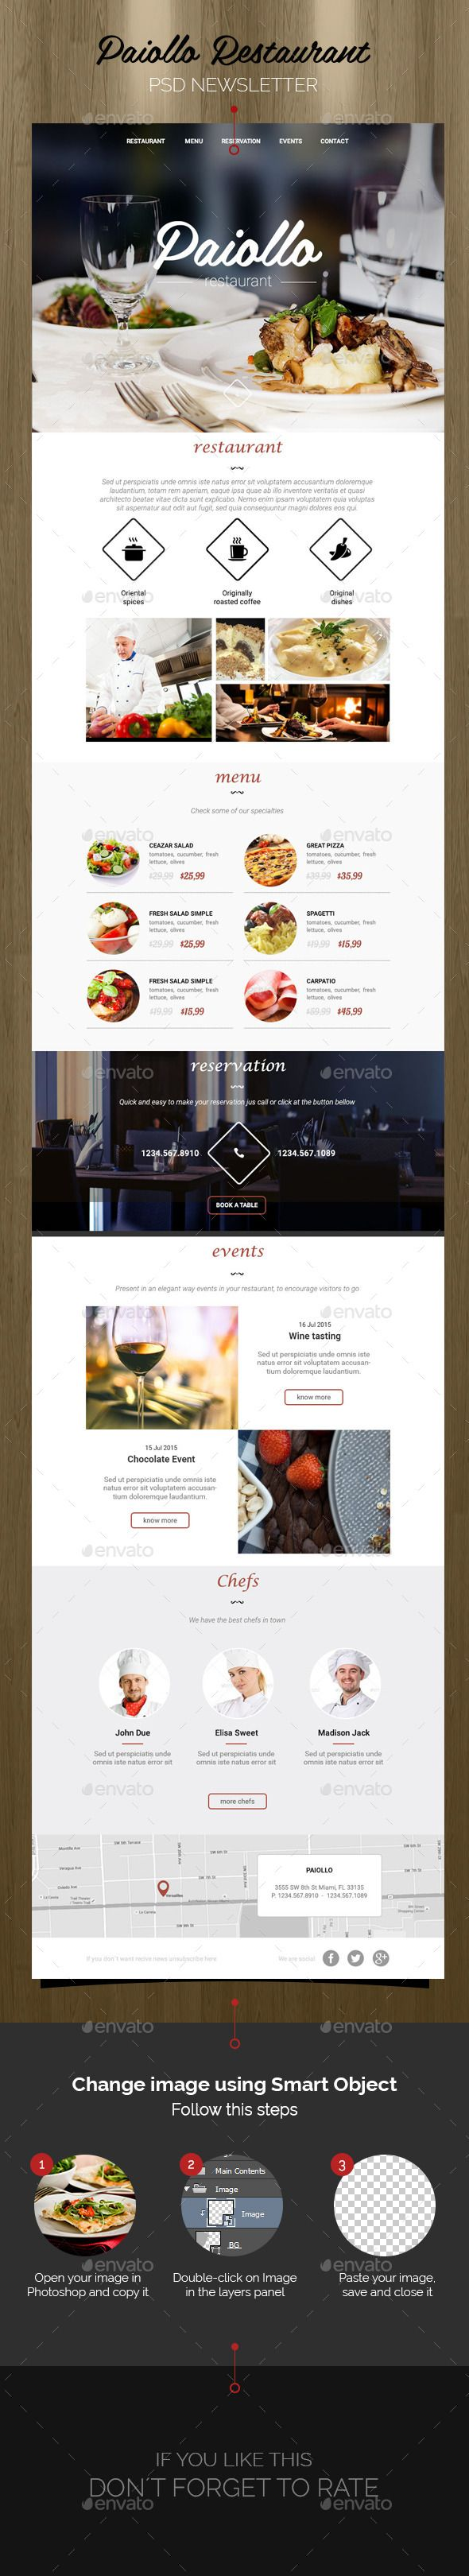 Paiollo Restaurant - Newsletter Template PSD - E-newsletters Web Elements